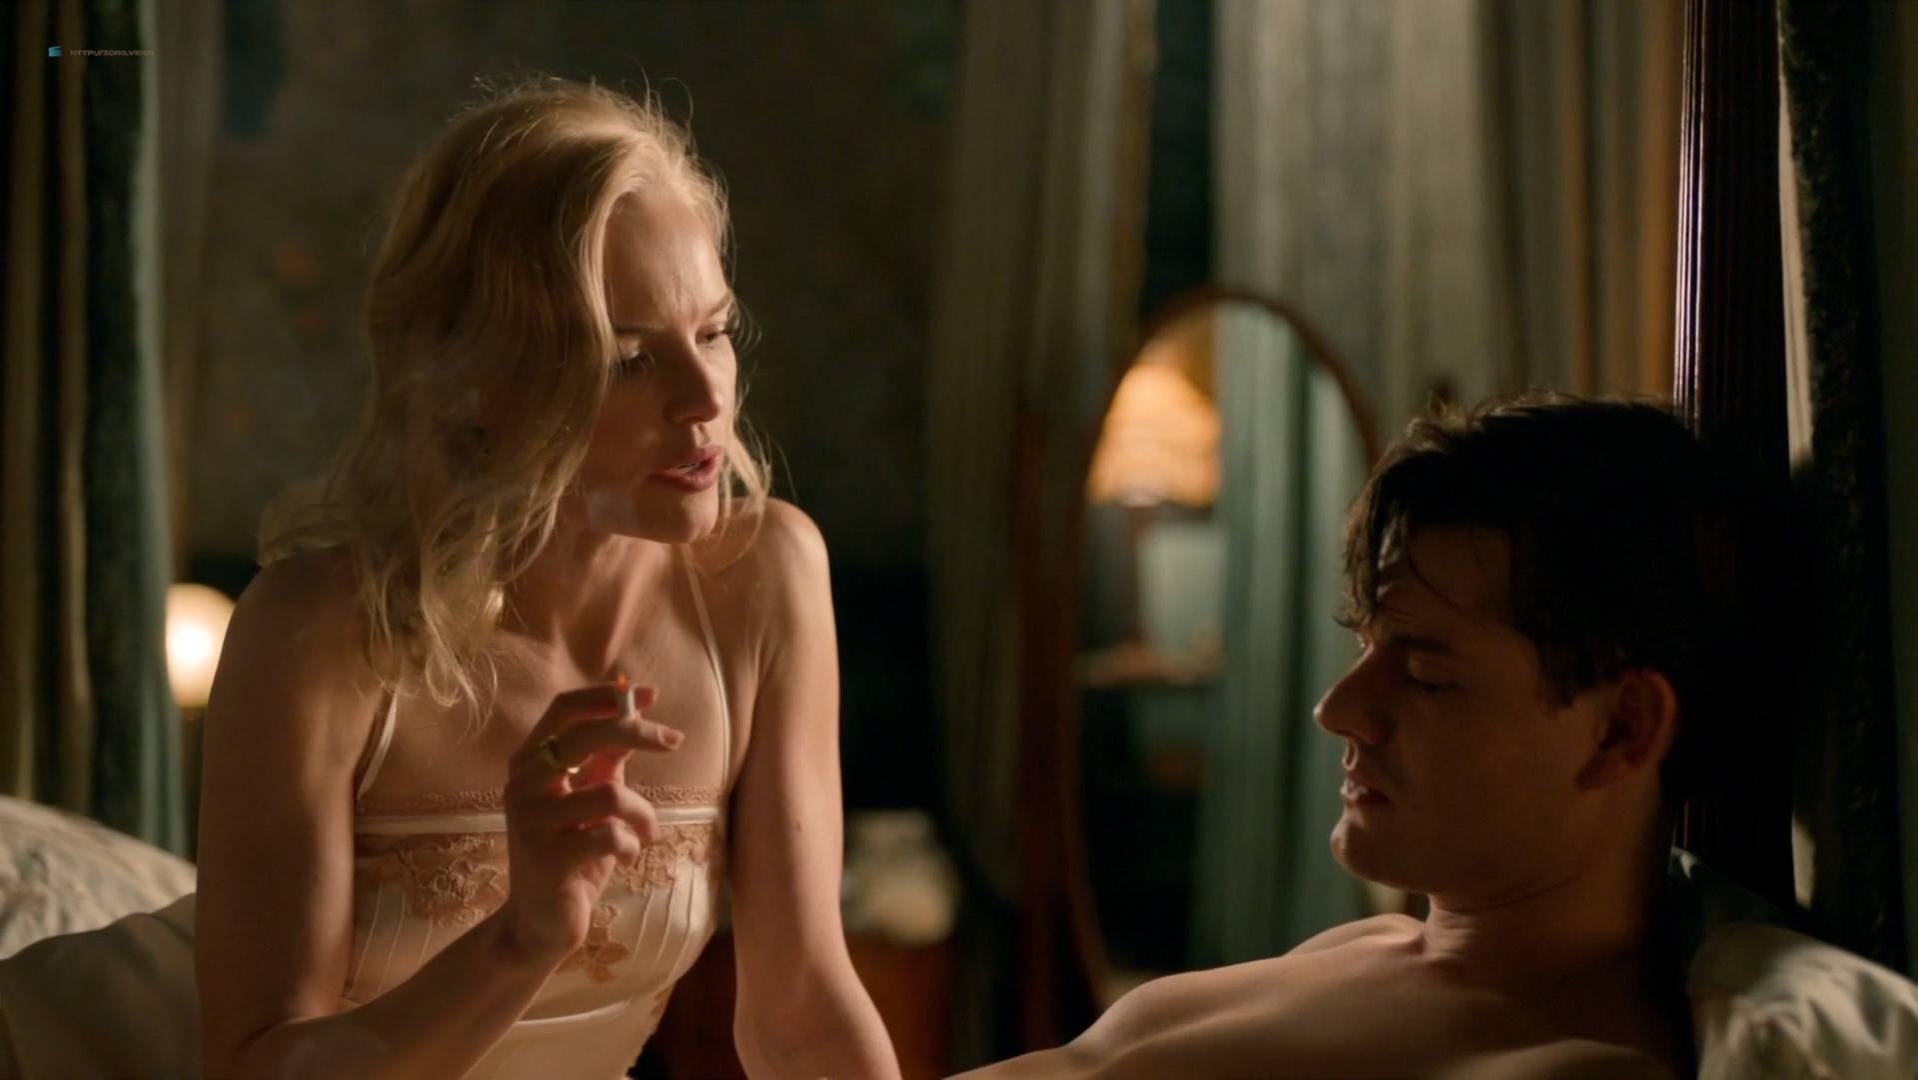 Kate Bosworth sexy - SS-GB s01e03 (2017)